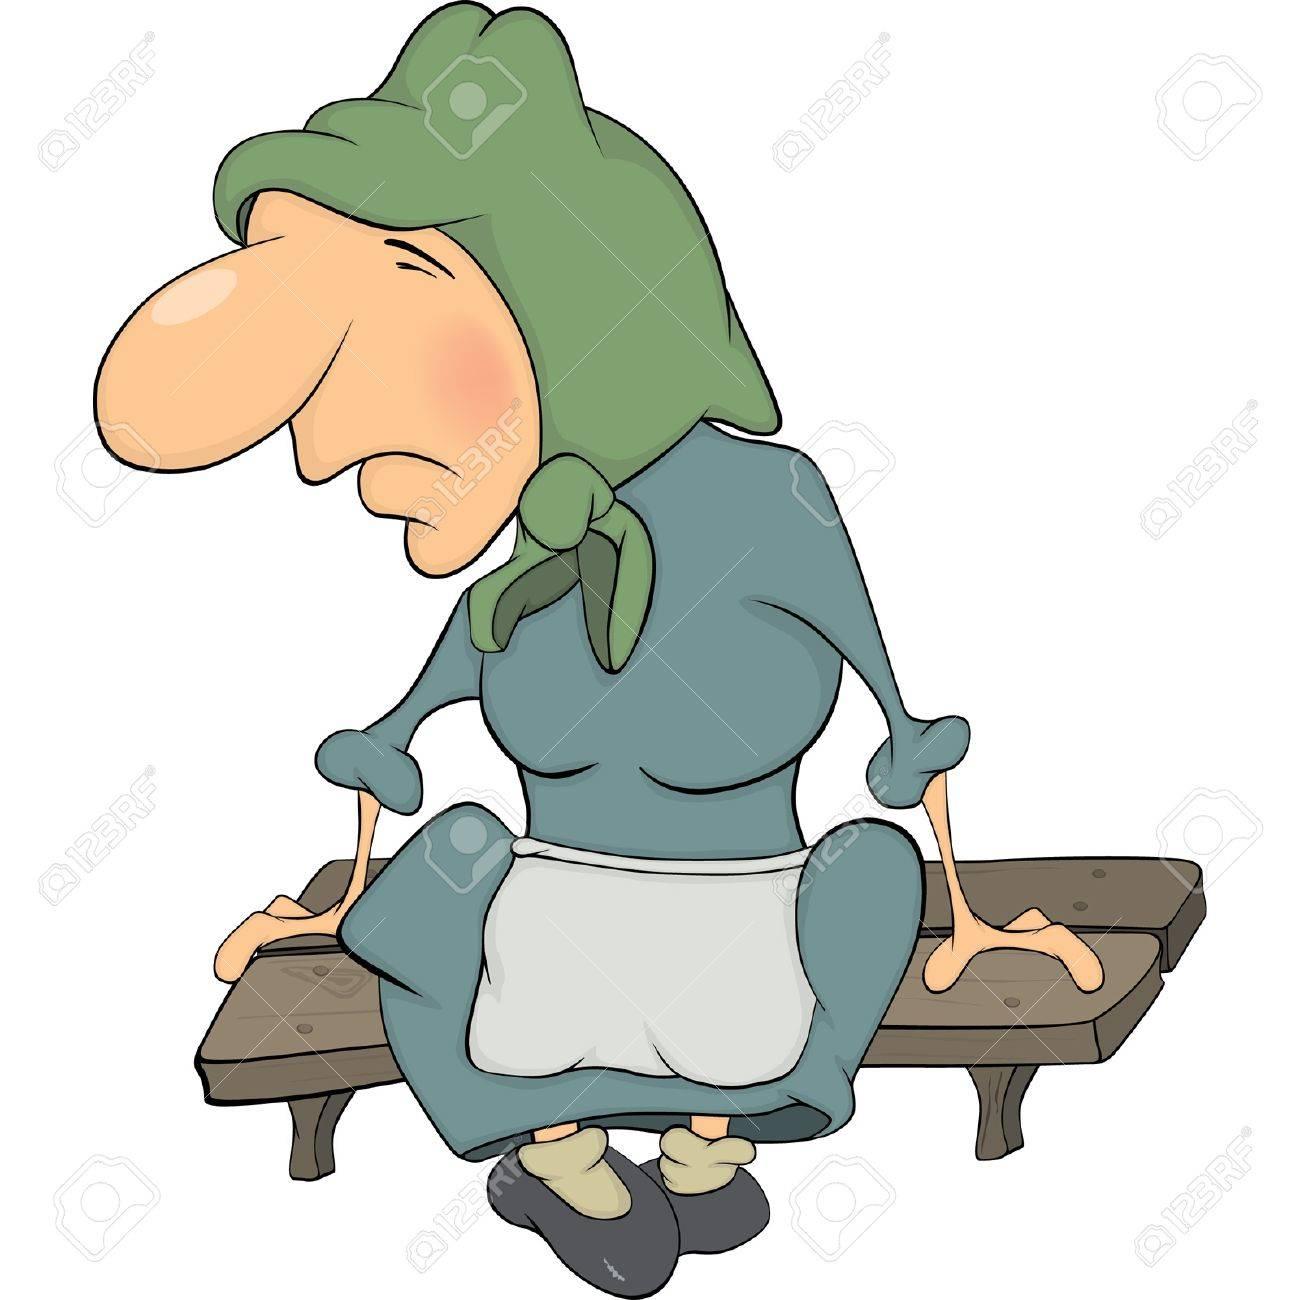 The grandmother on a bench cartoon Stock Vector - 14103413